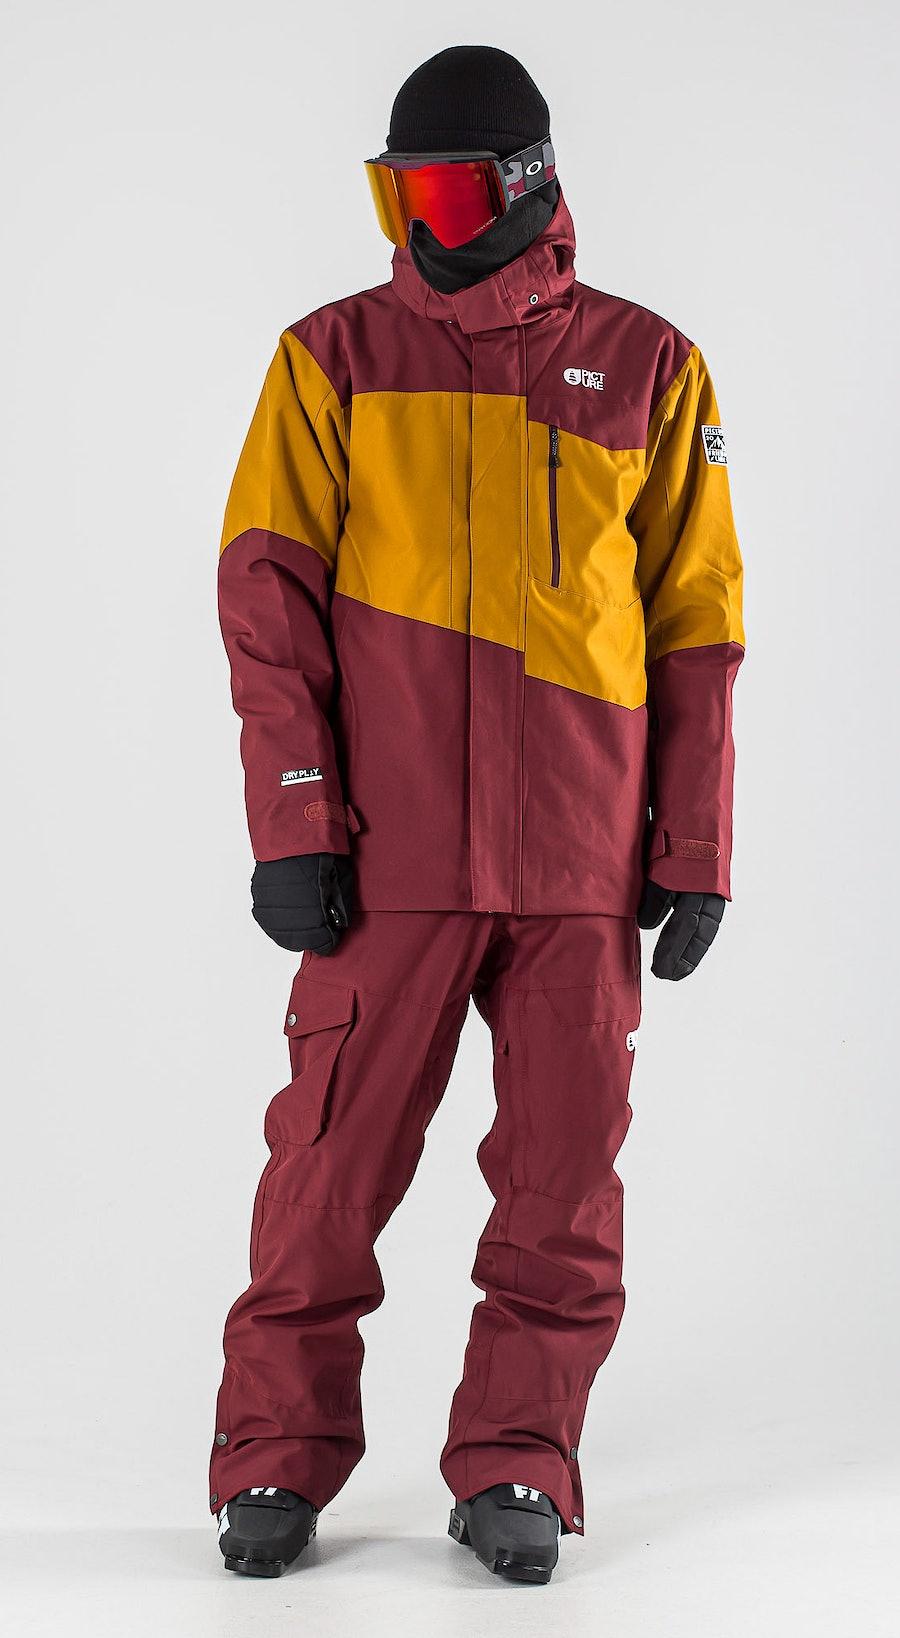 Picture Styler Camel Ketchup Ski kleding Multi